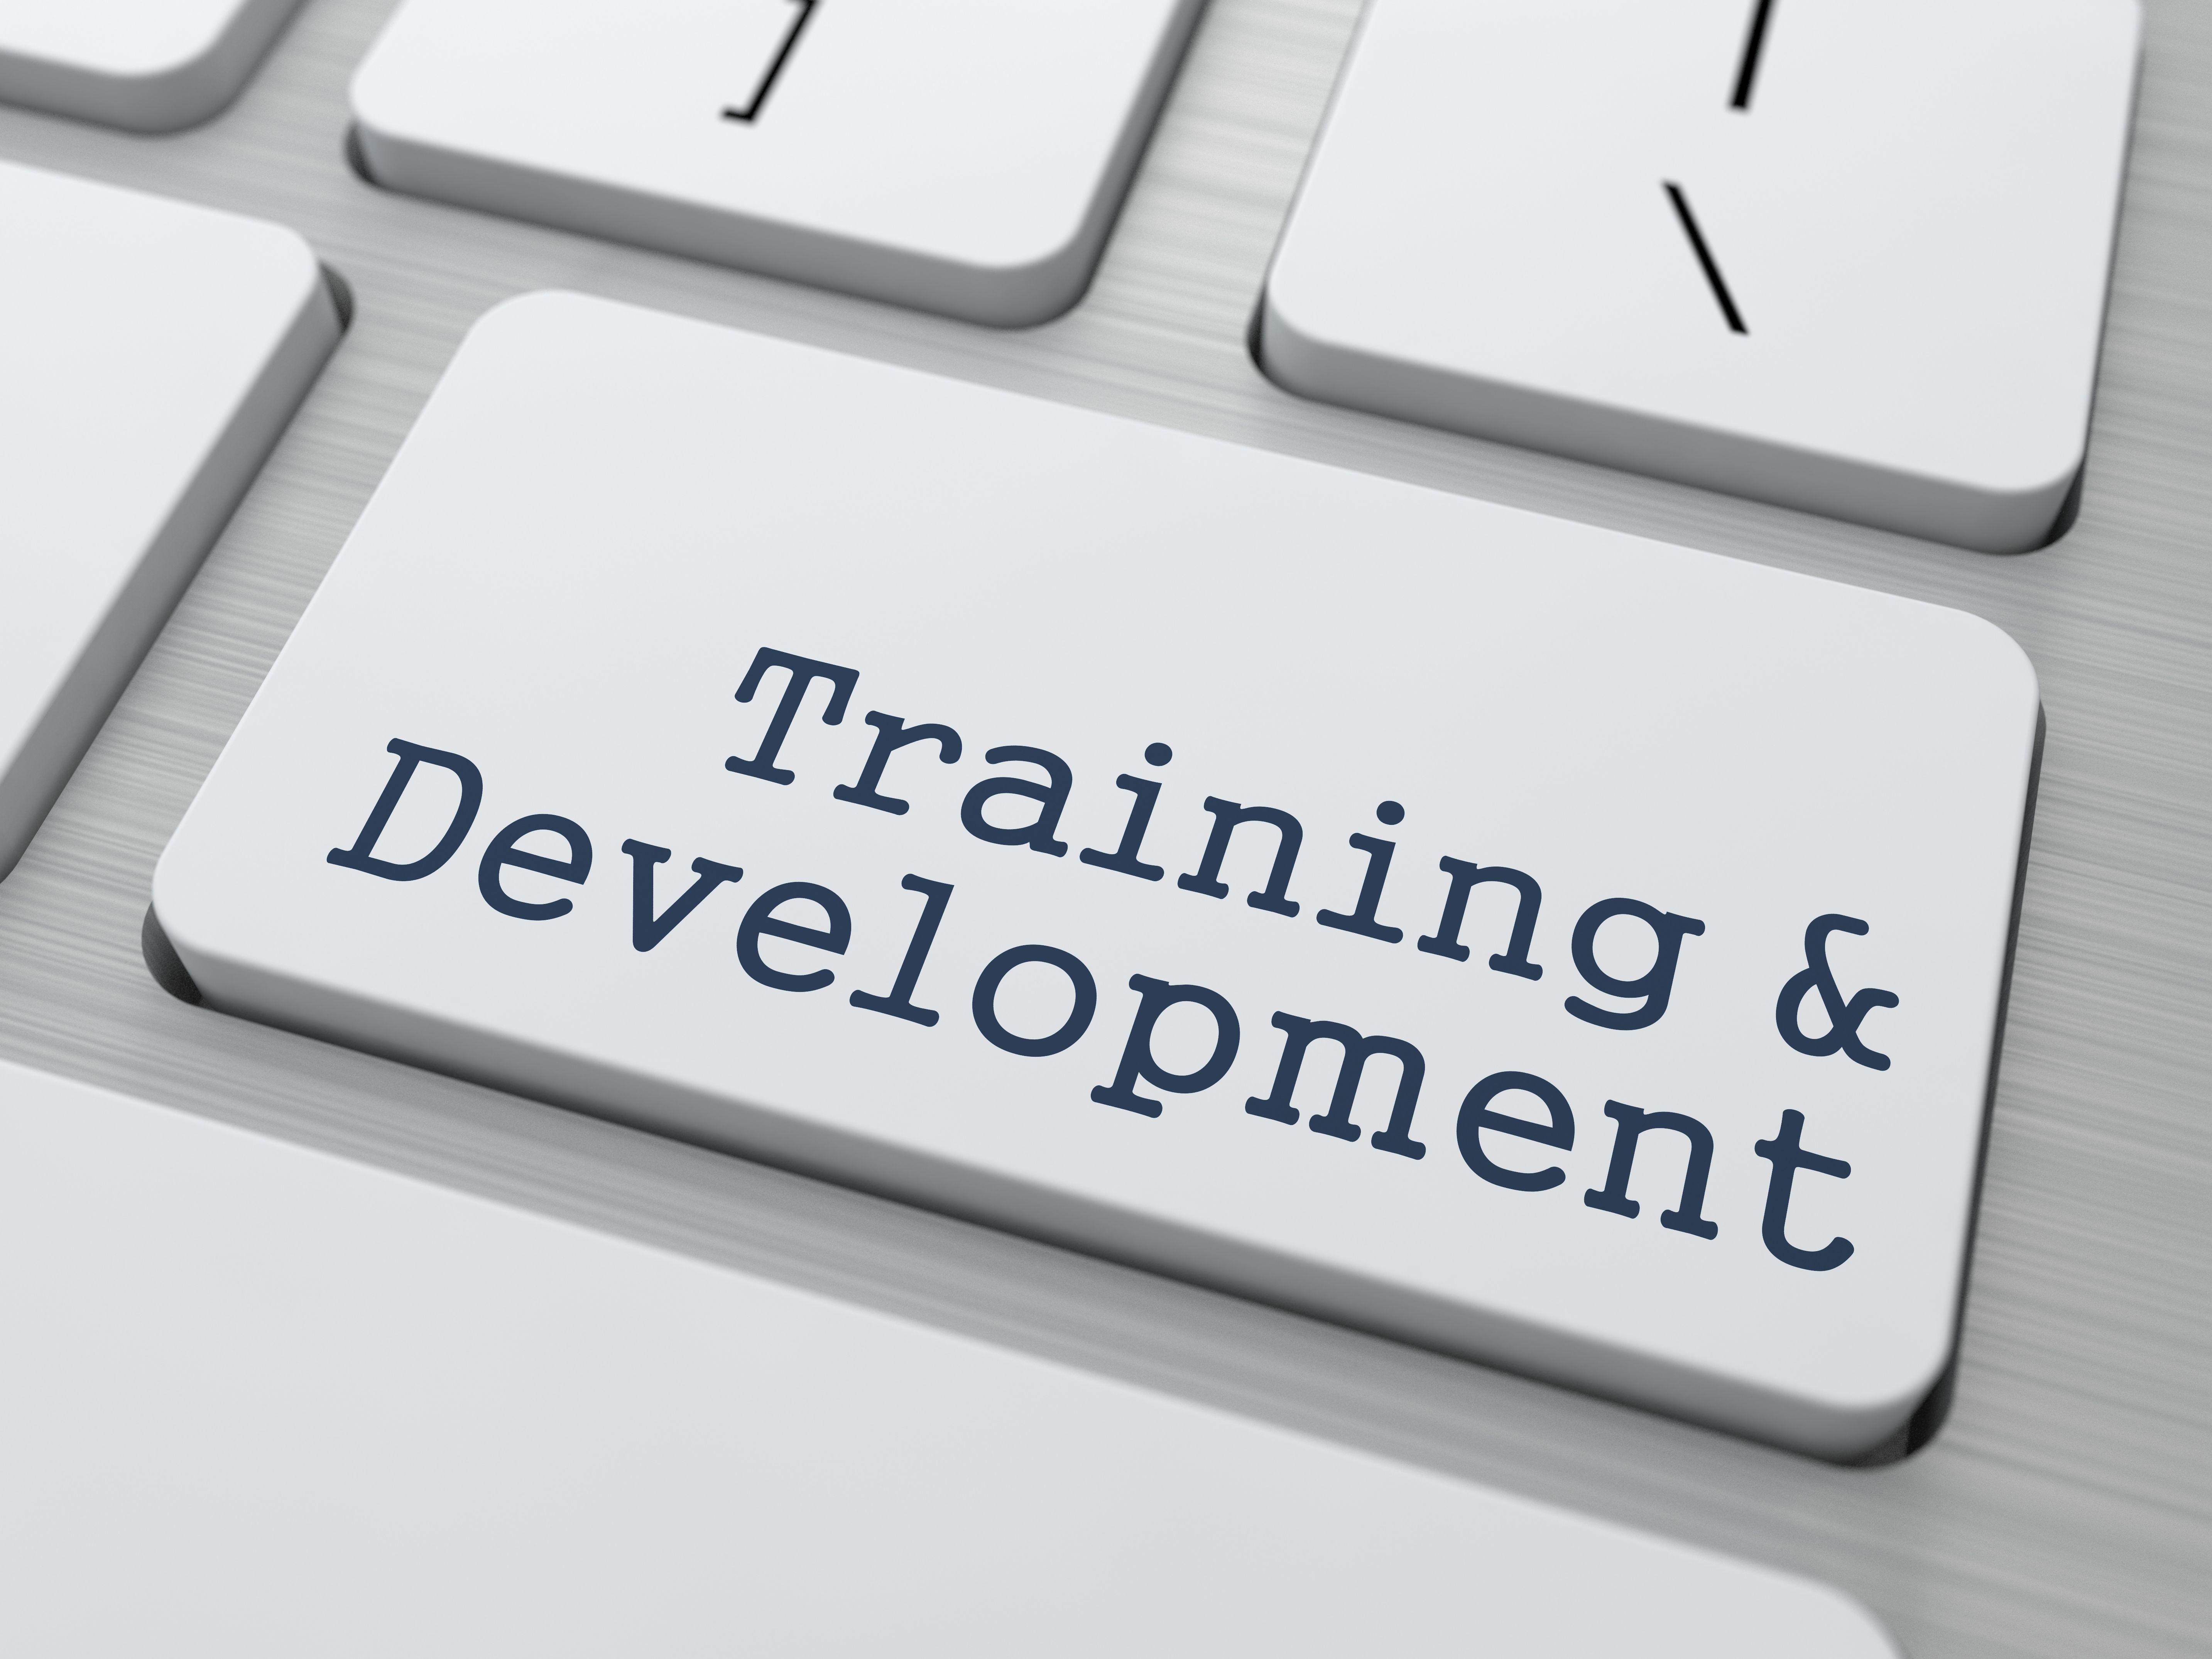 Online course human resources exam prep phr phr here i come online course human resources exam prep phr xflitez Choice Image